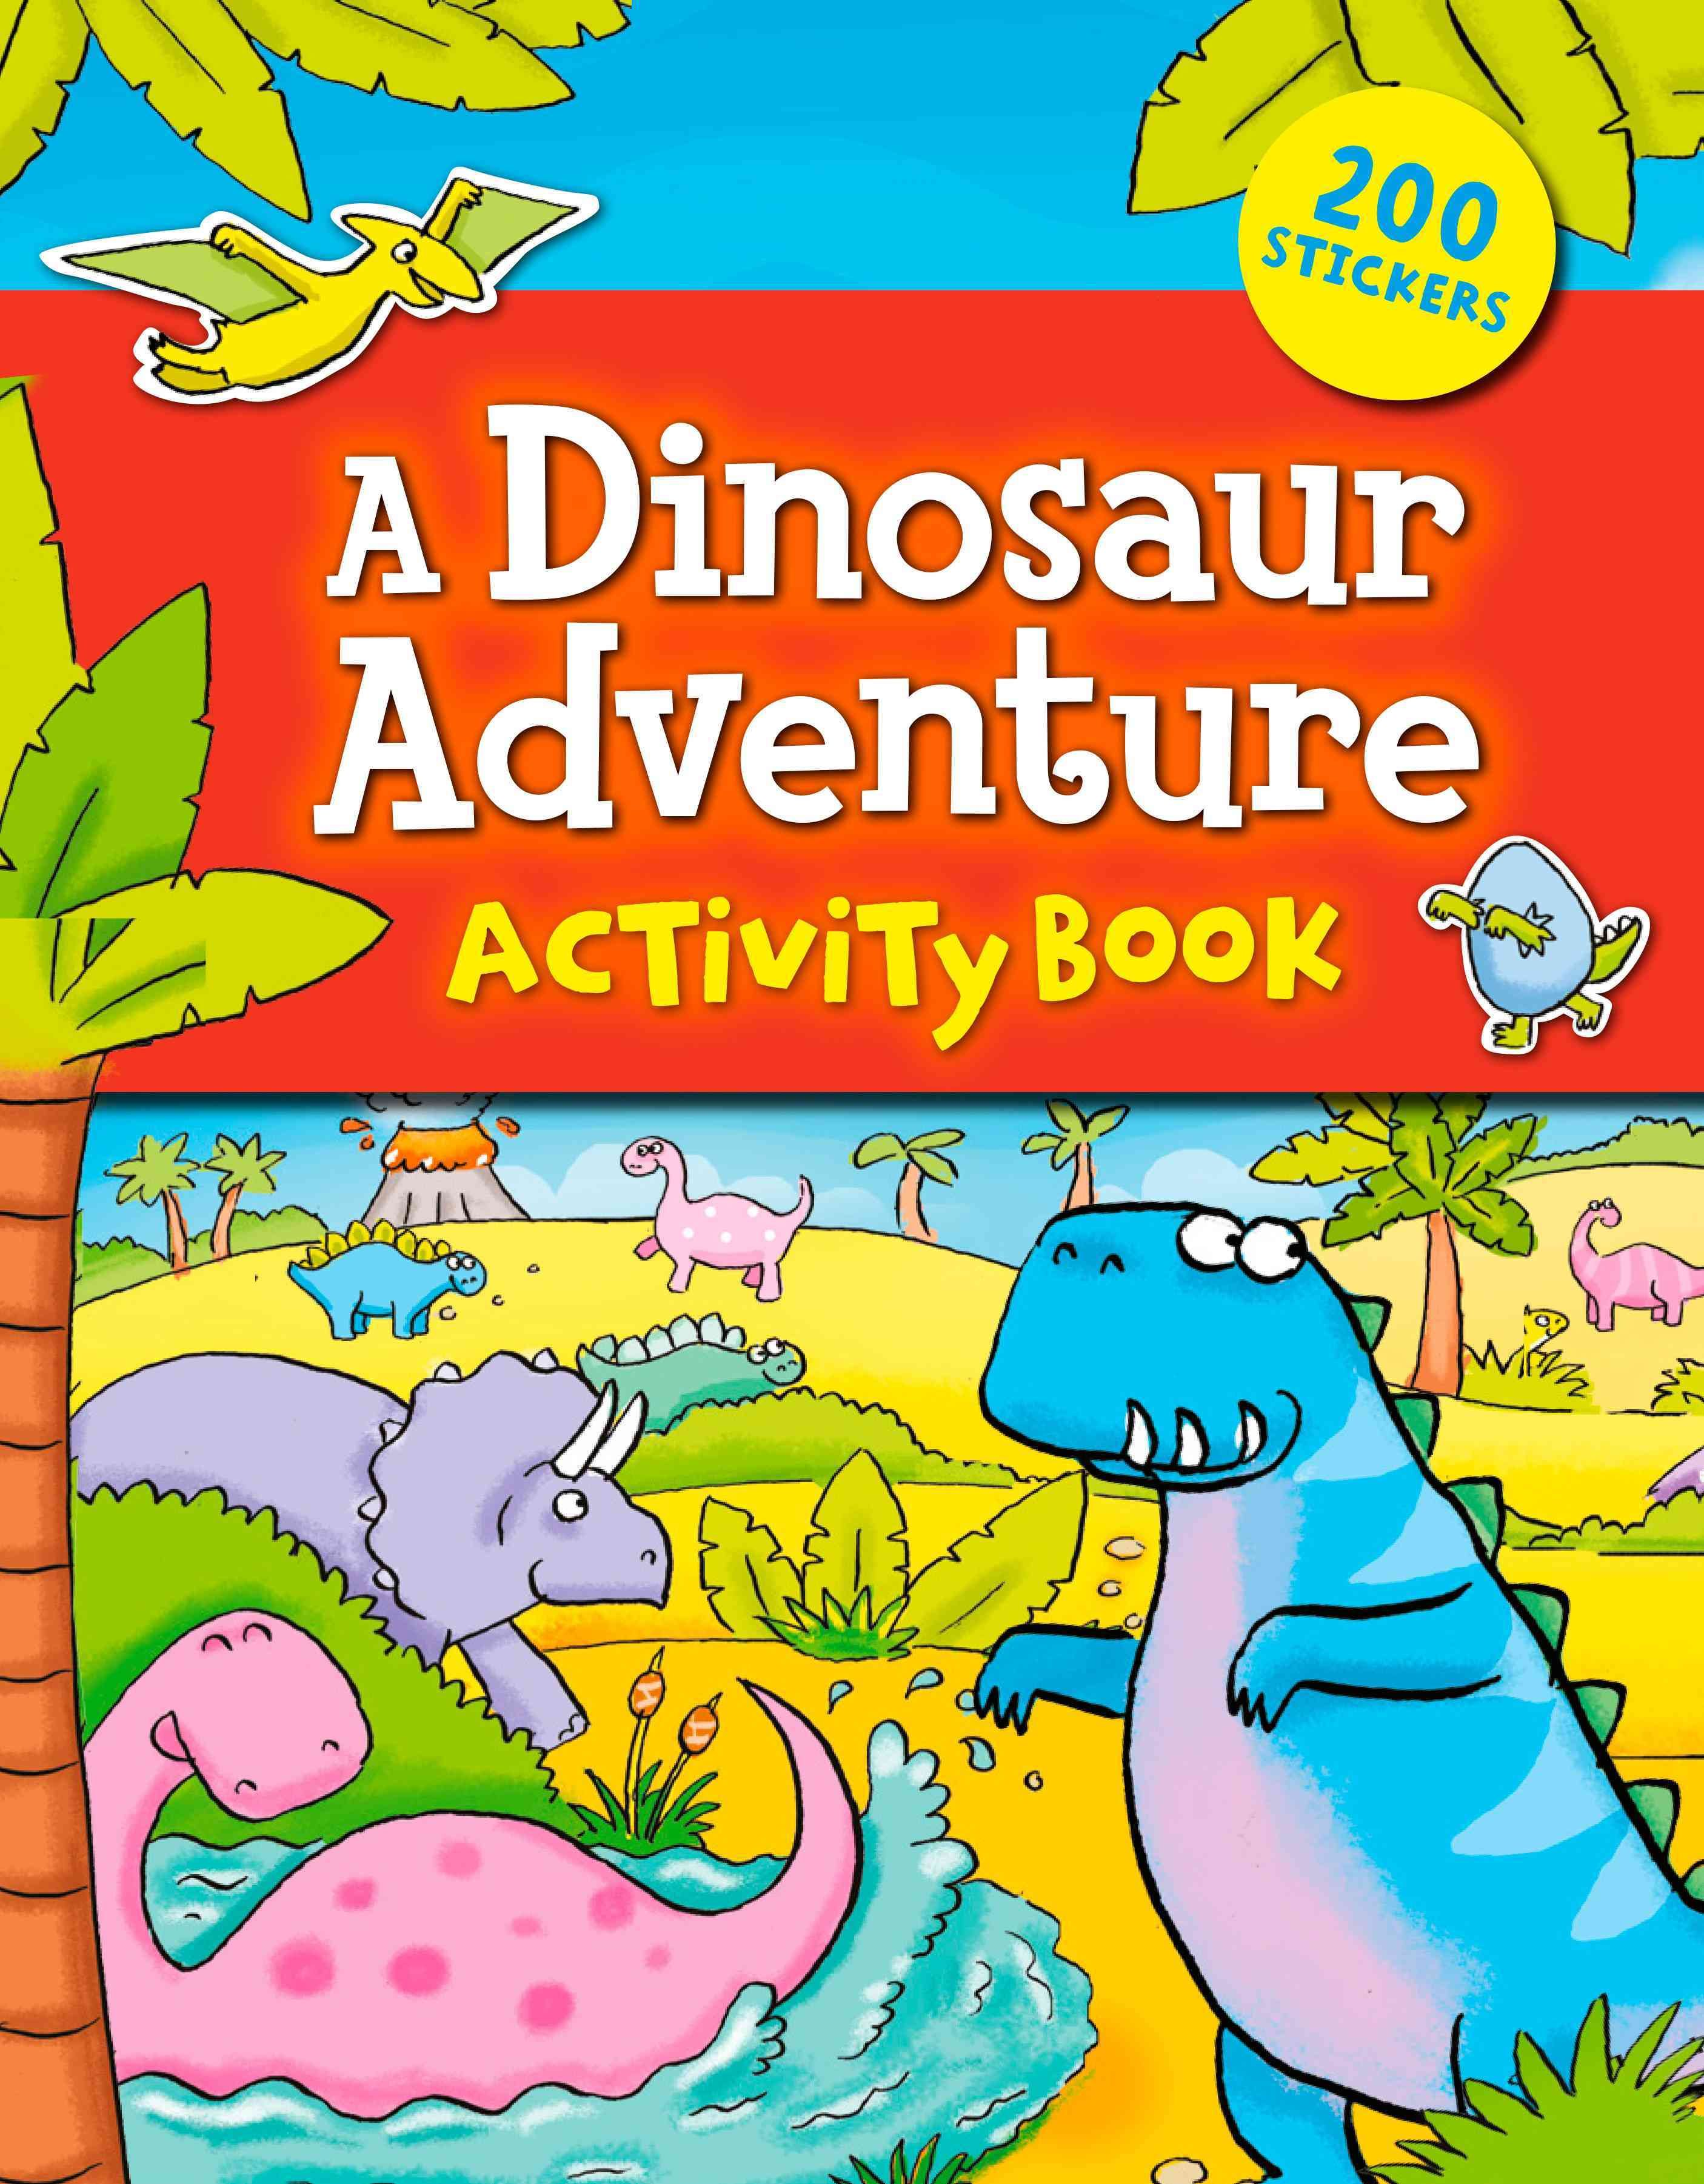 A Dinosaur Adventure Sticker Activity Book